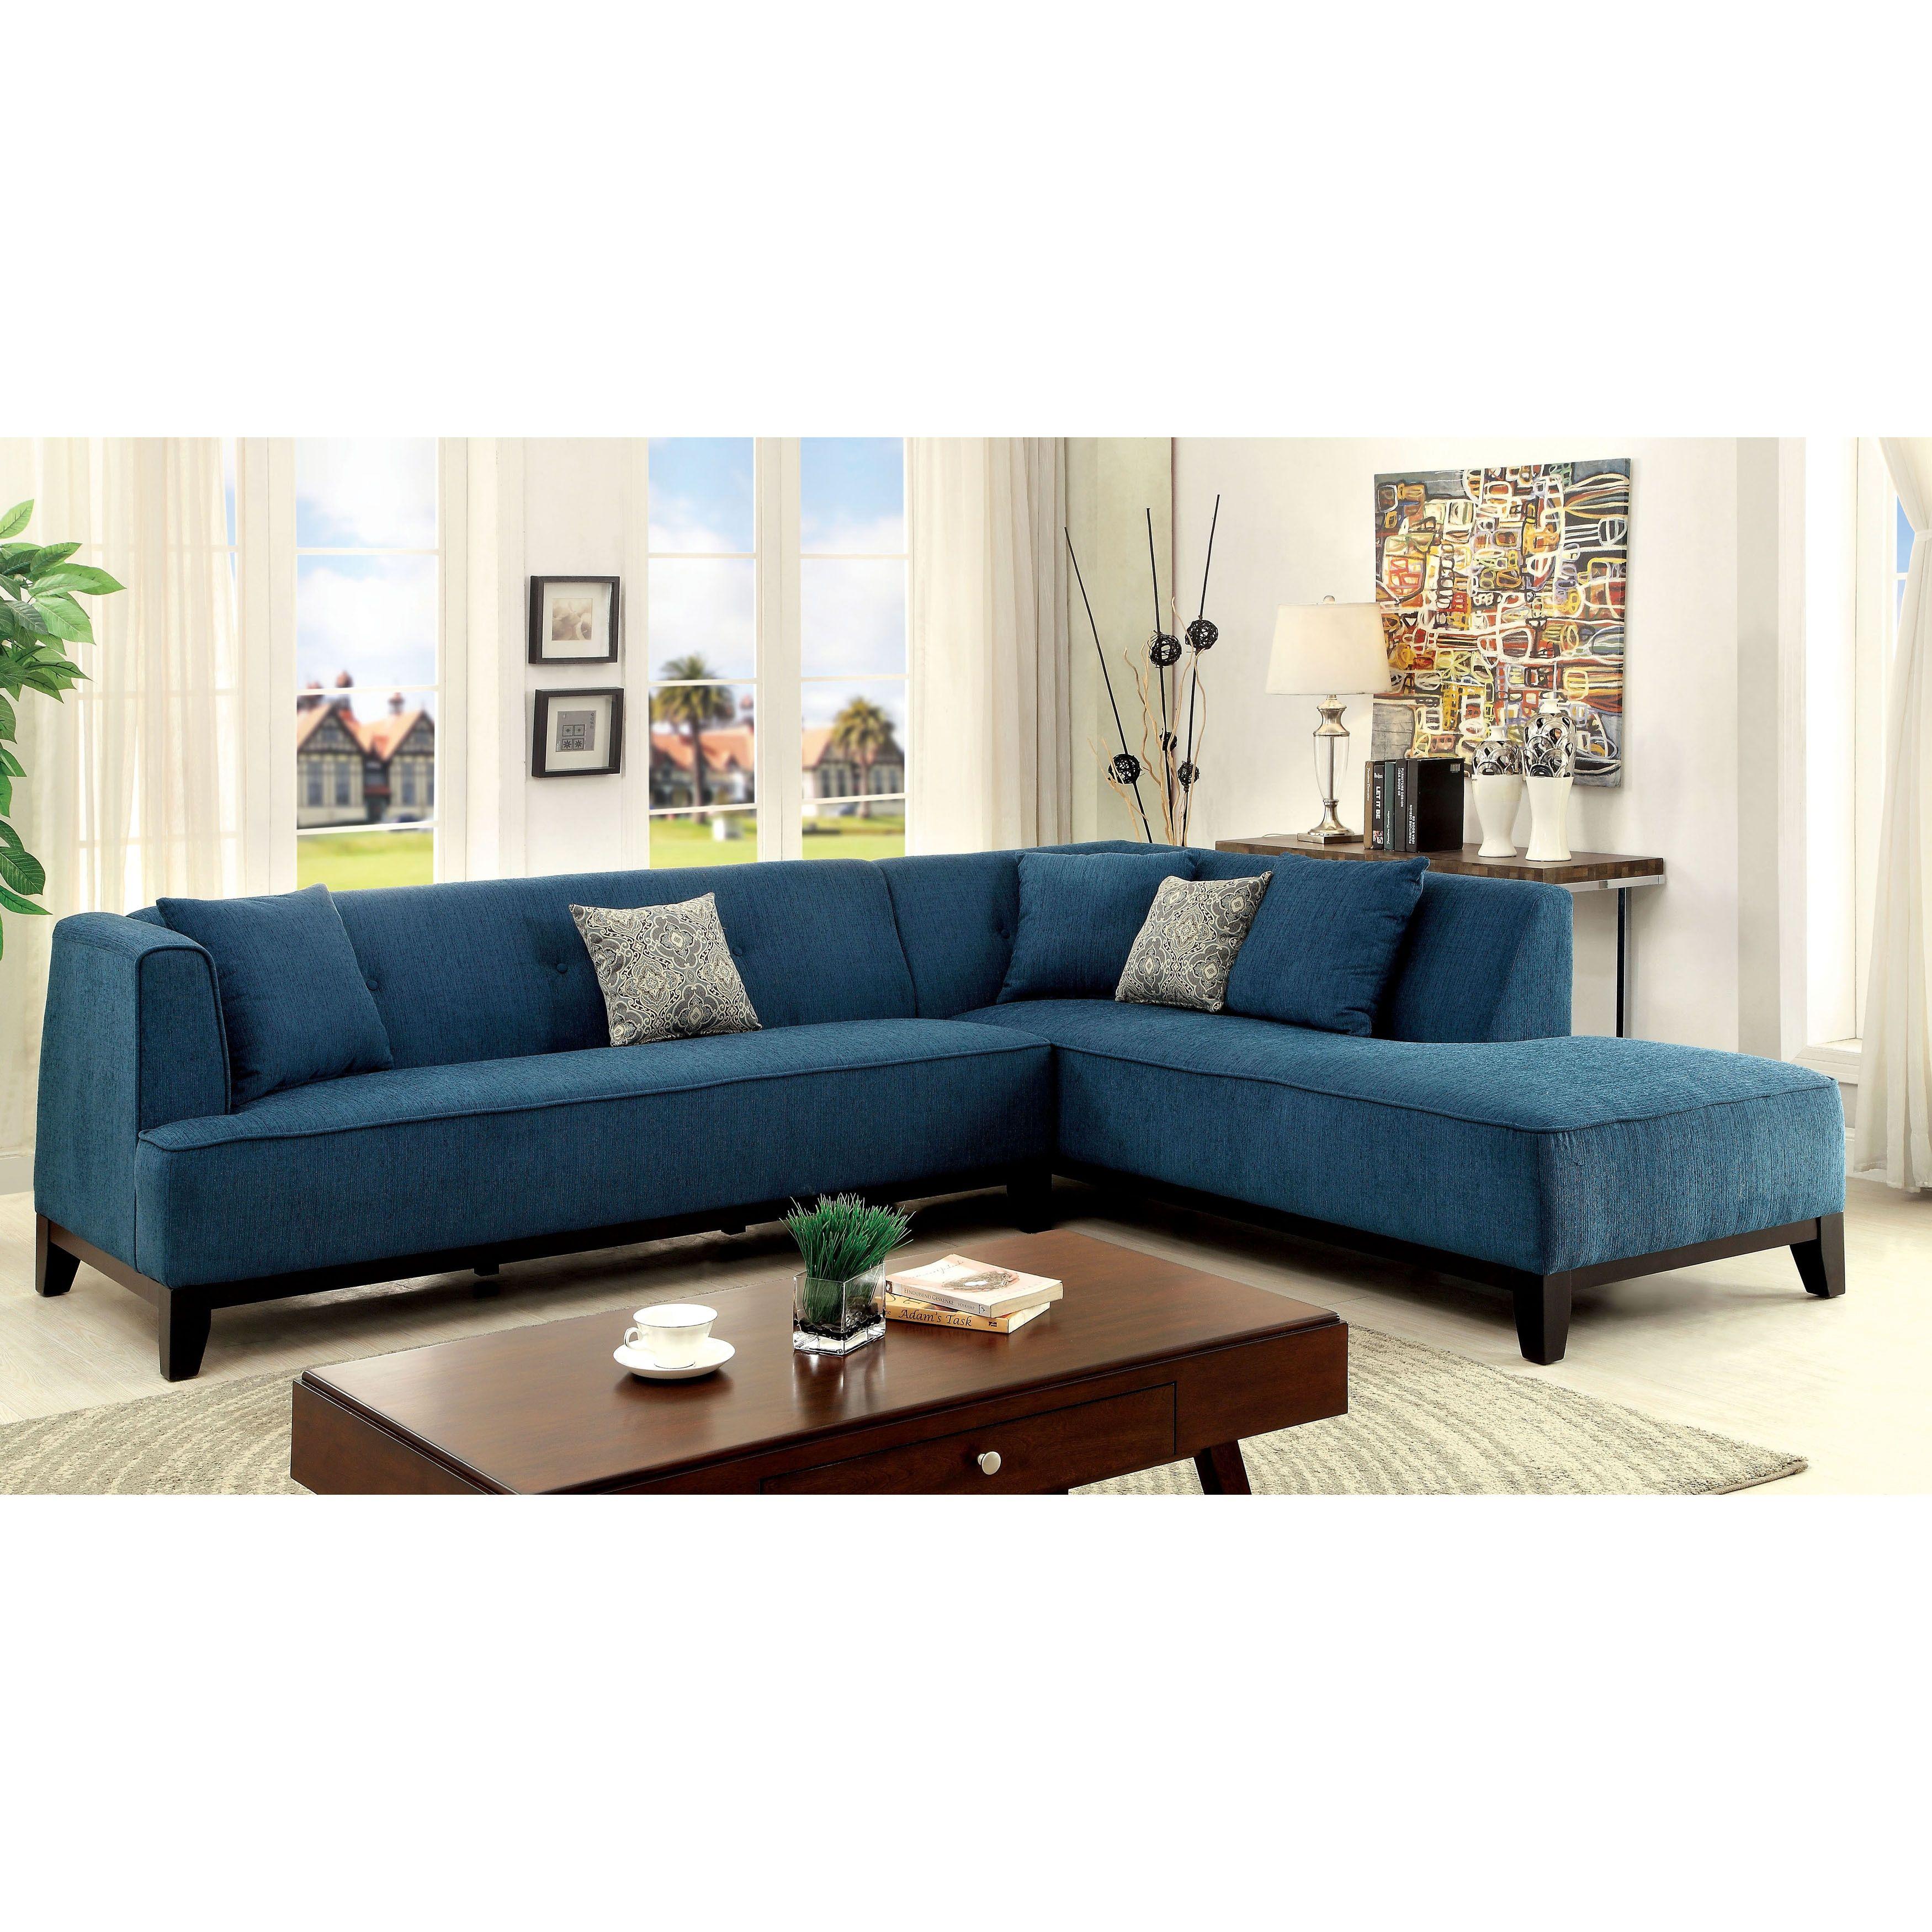 Furniture of America Esmone Modern Tuxedo Linen Sectional Beige